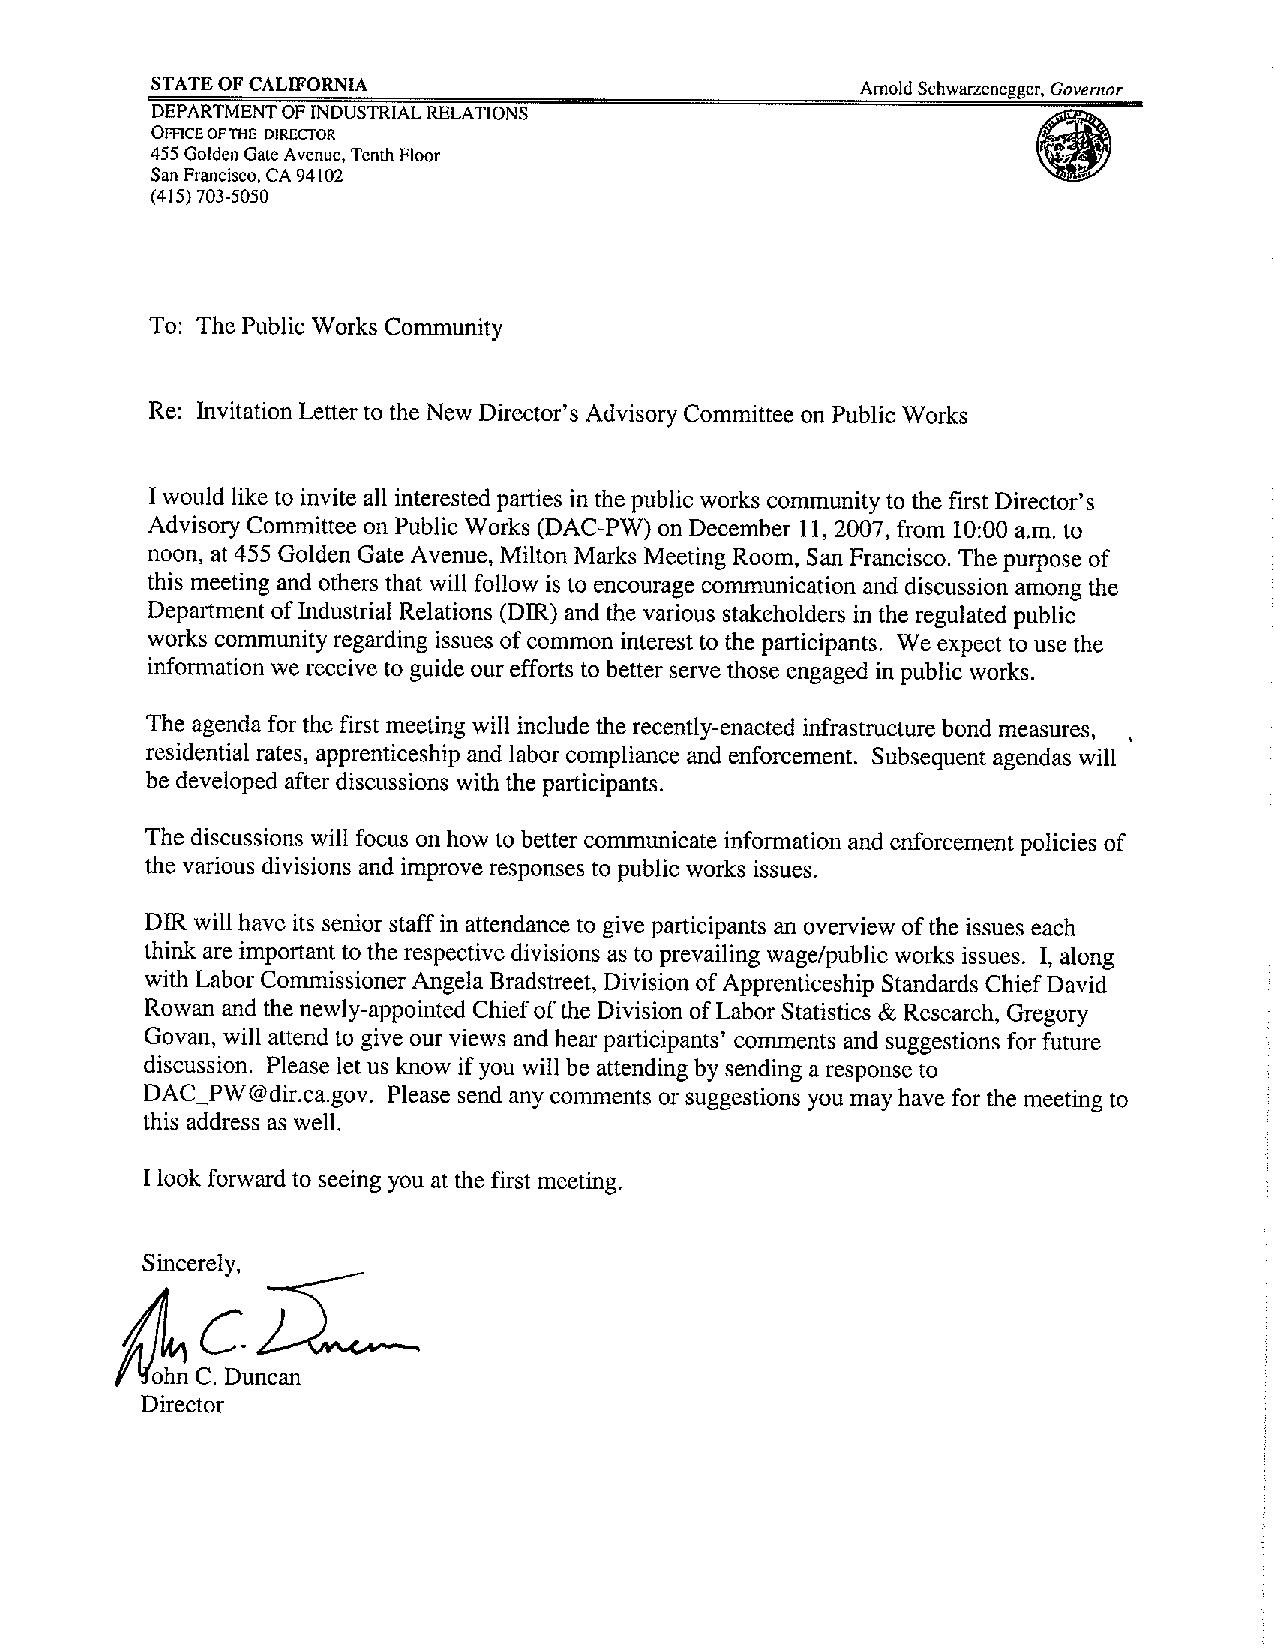 Advisory Board Invitation Letter Ivoiregion